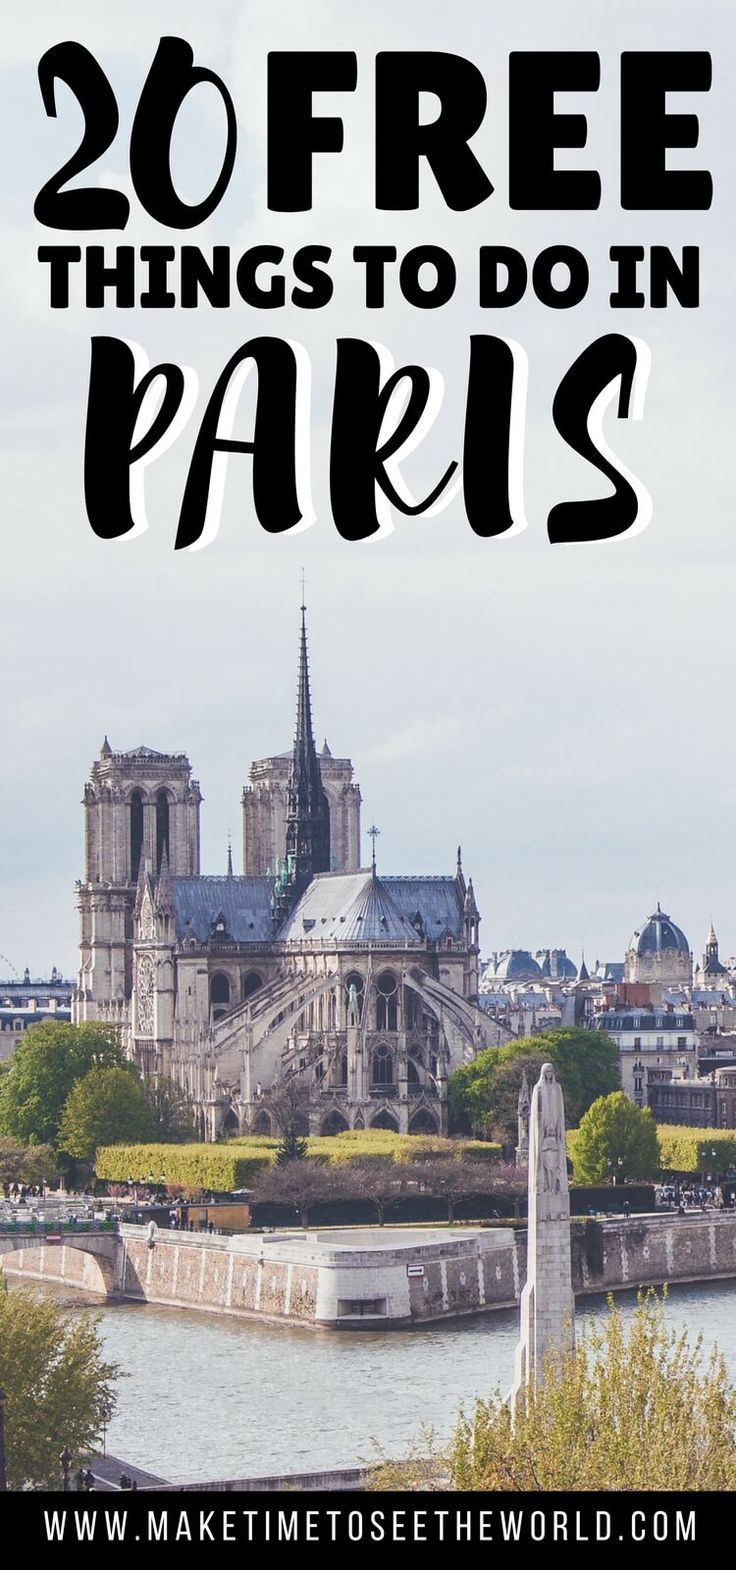 20 free things to do in paris free things paris paris and city